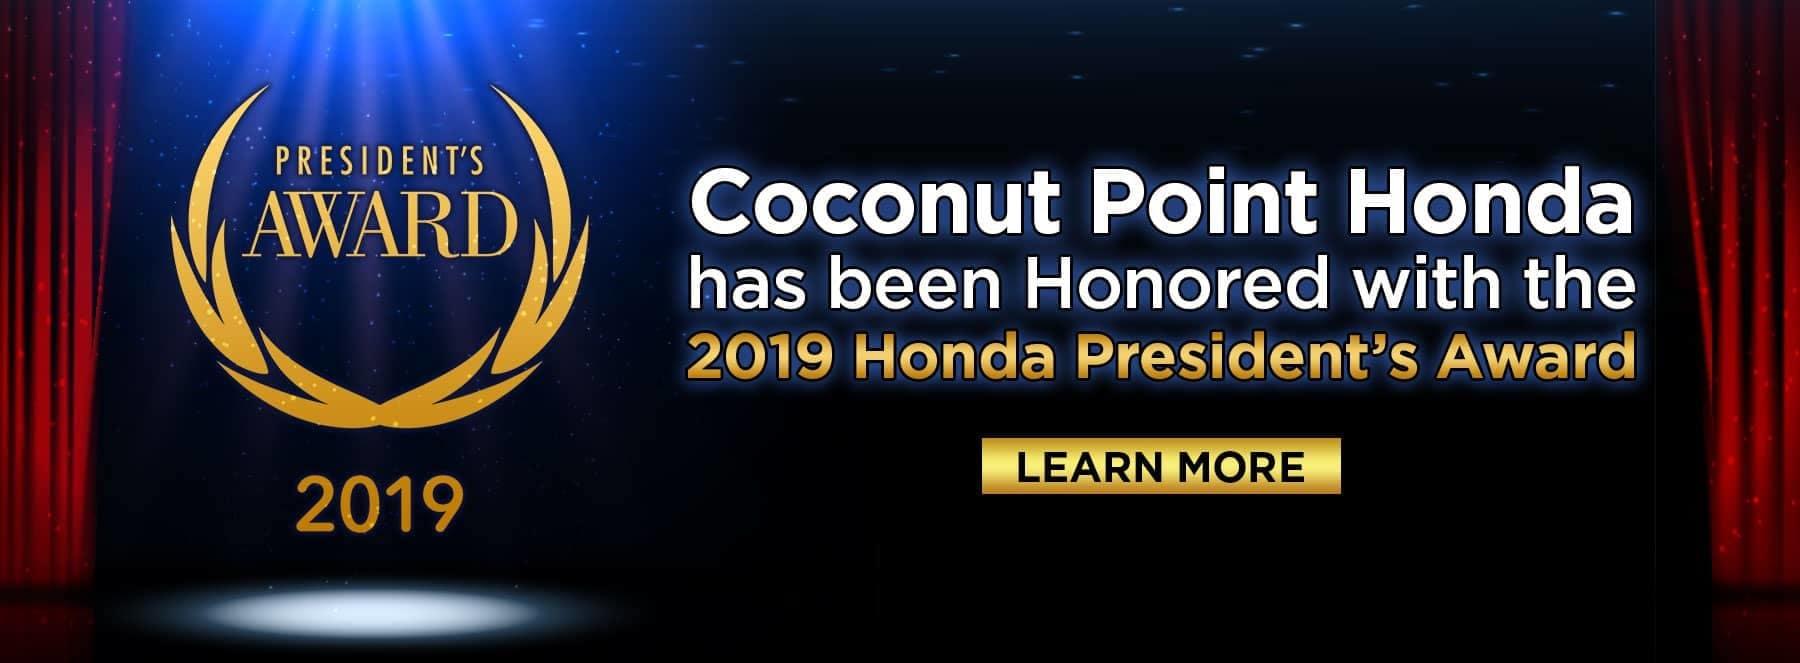 2019 Presidents Award